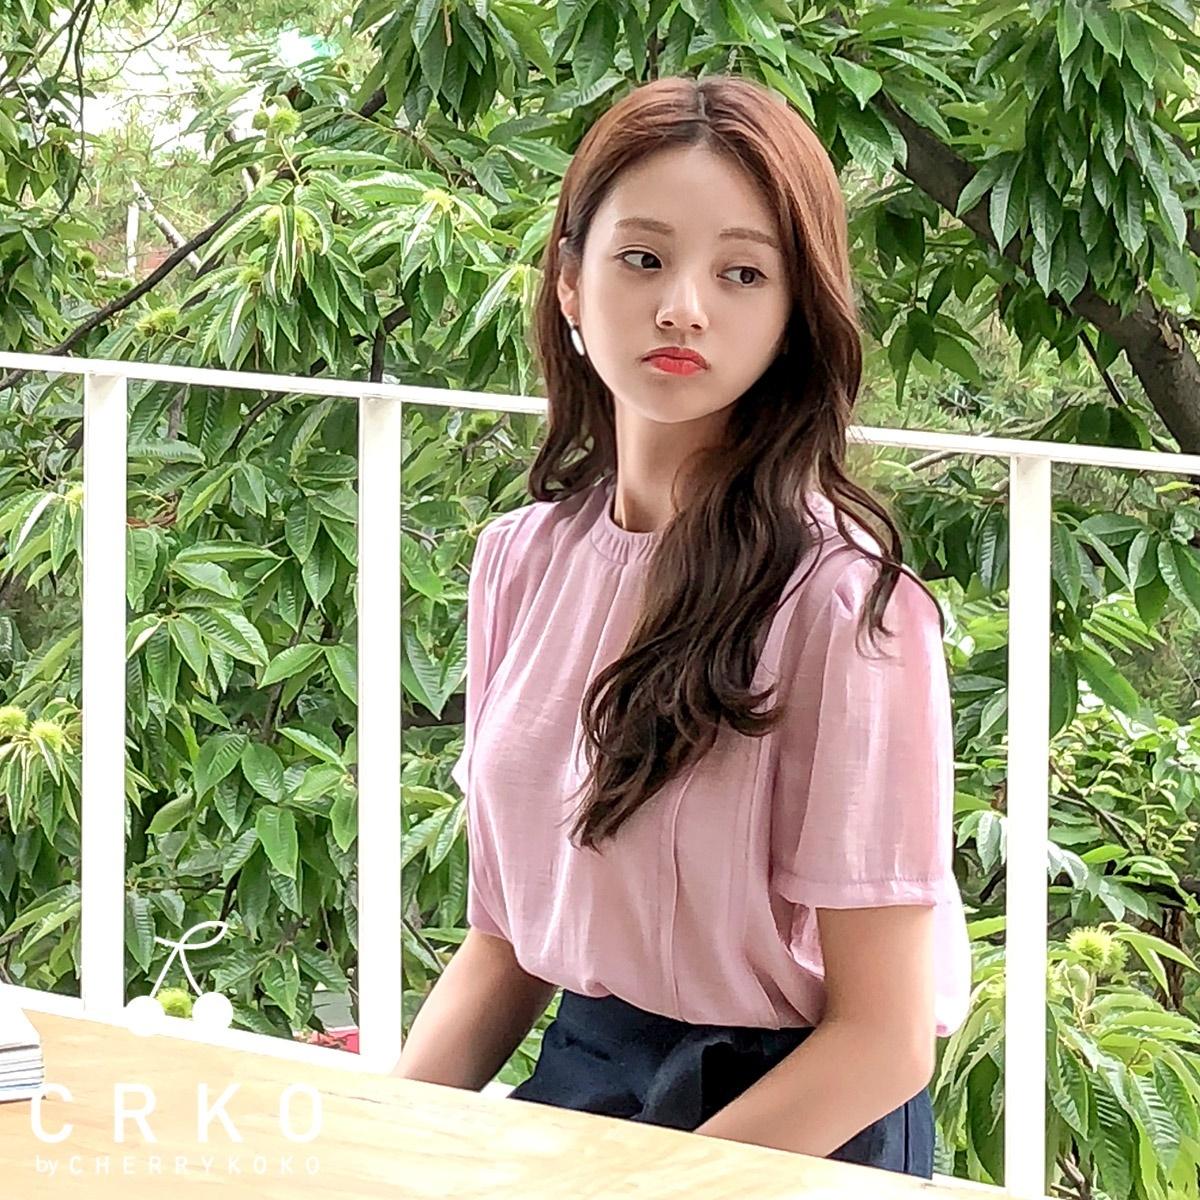 [CHERRYKOKO官方旗艦店] 圓領襯衫 Daily Round Neck Blouse / a peony blouse